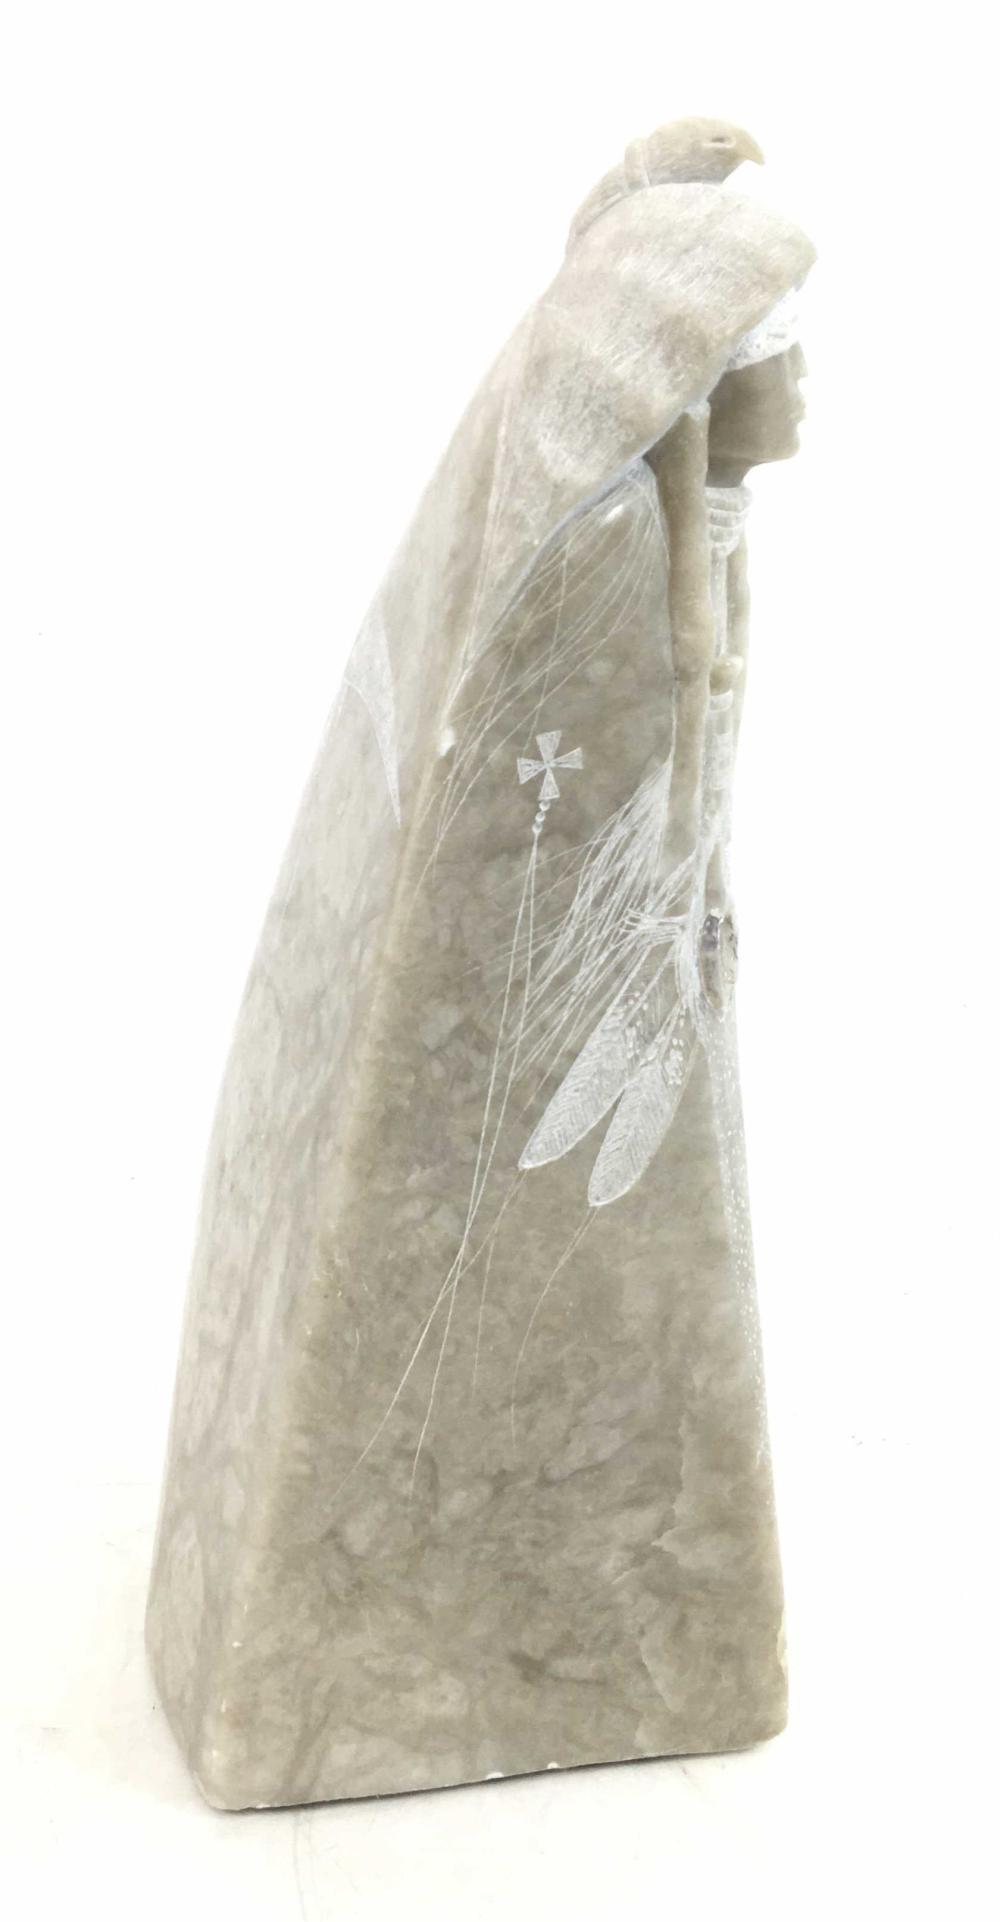 Orlando C. Joe Sr. (b.1958) Alabaster Sculpture